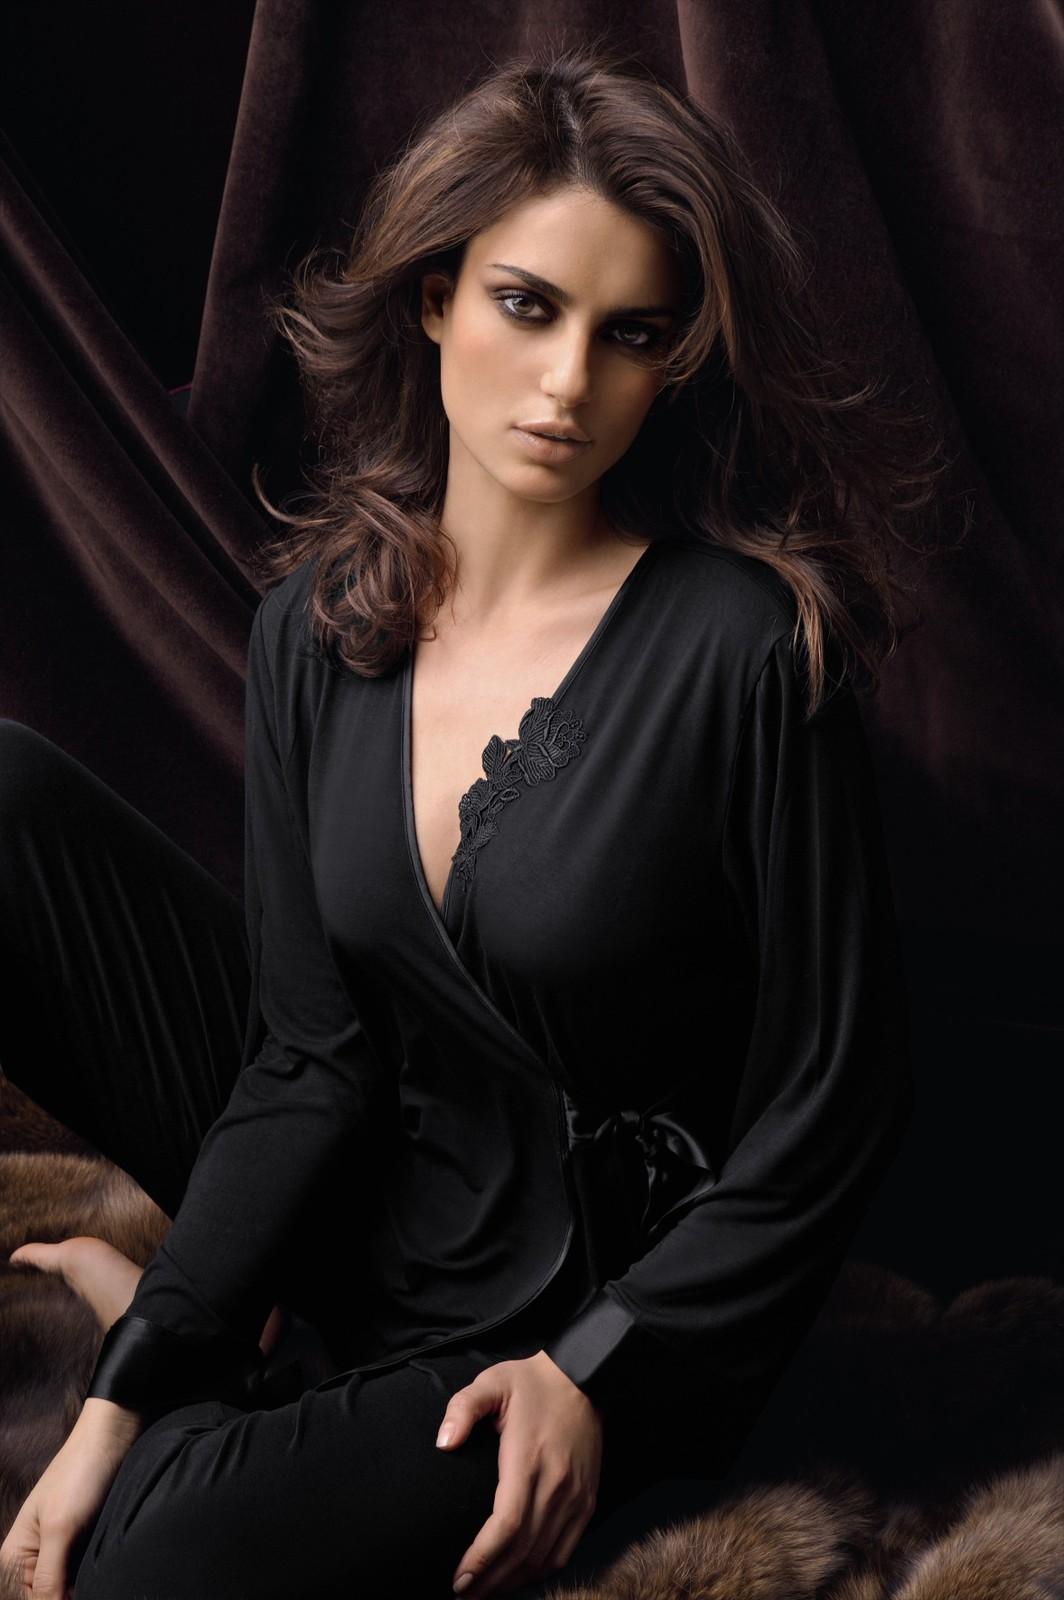 cantrinel menghia luks wowsome in lise charmel lingerie. Black Bedroom Furniture Sets. Home Design Ideas